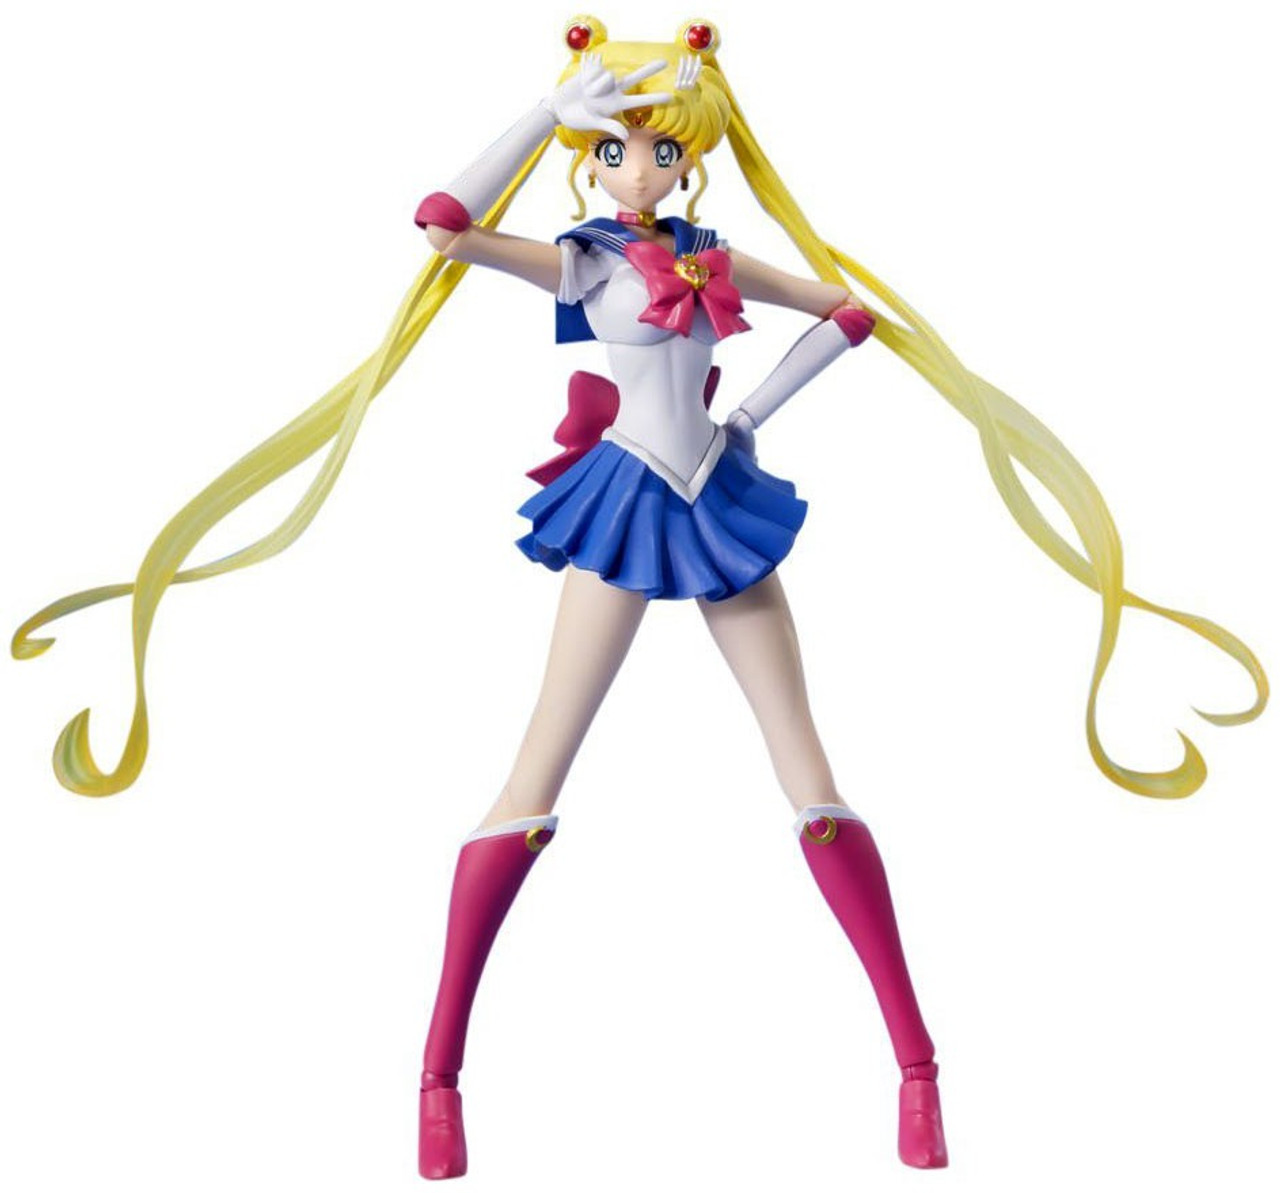 Sailor Moon Crystal S.H. Figuarts Sailor Moon 5.3 Action